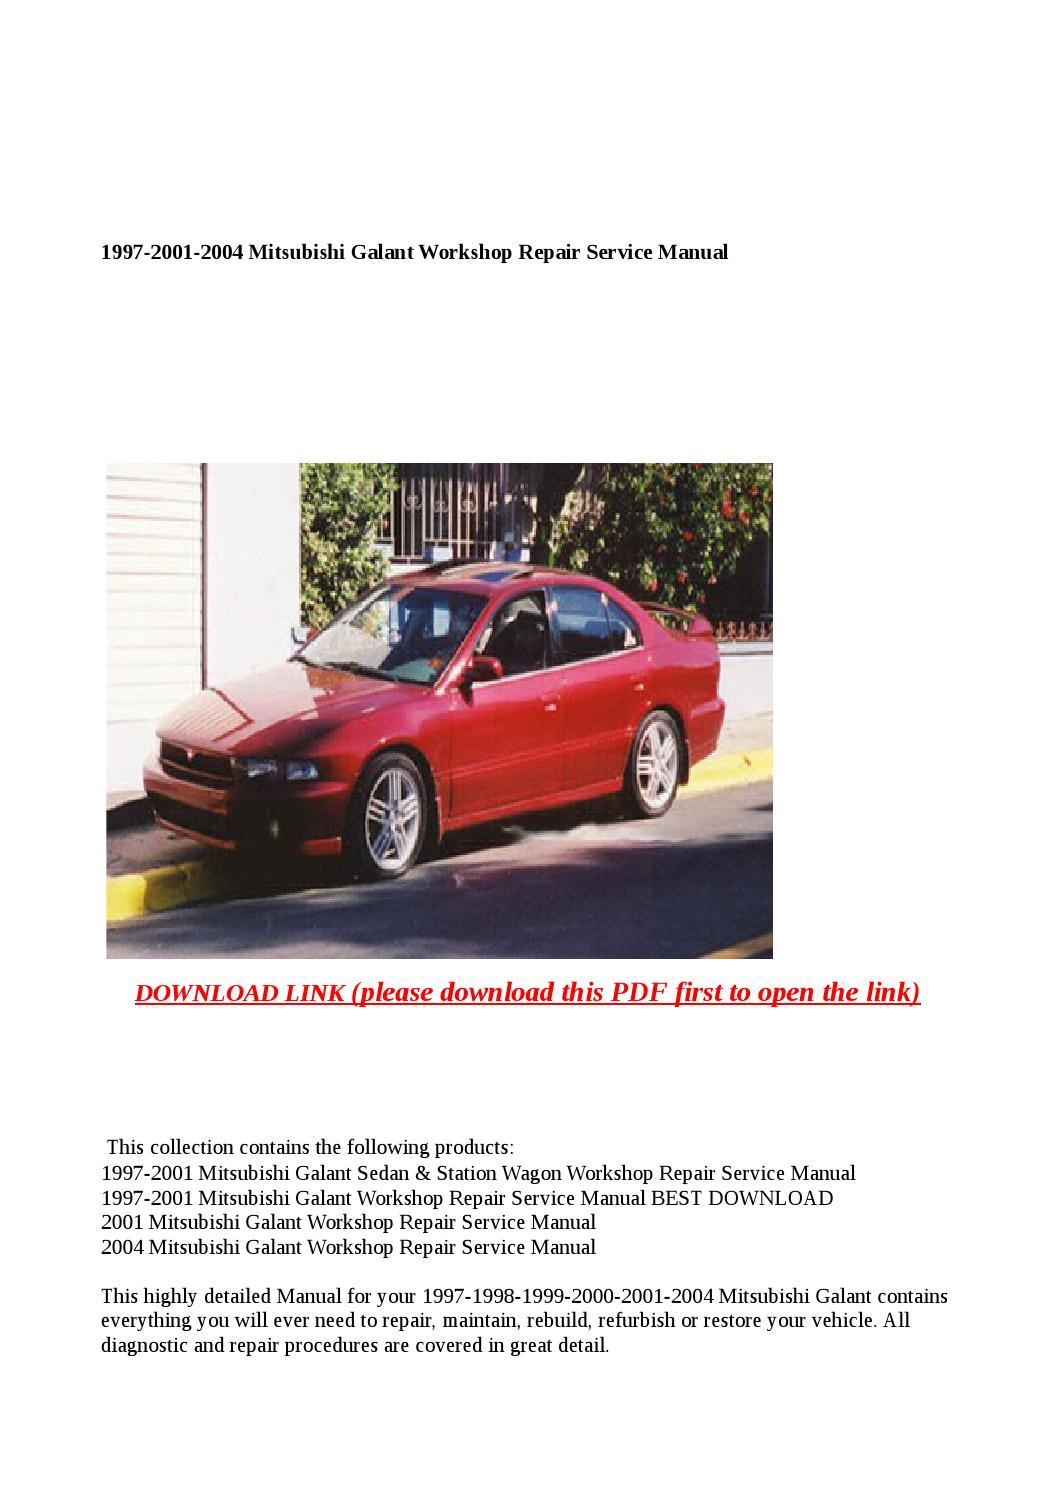 Mitsubishi galant 2001 manual pdf